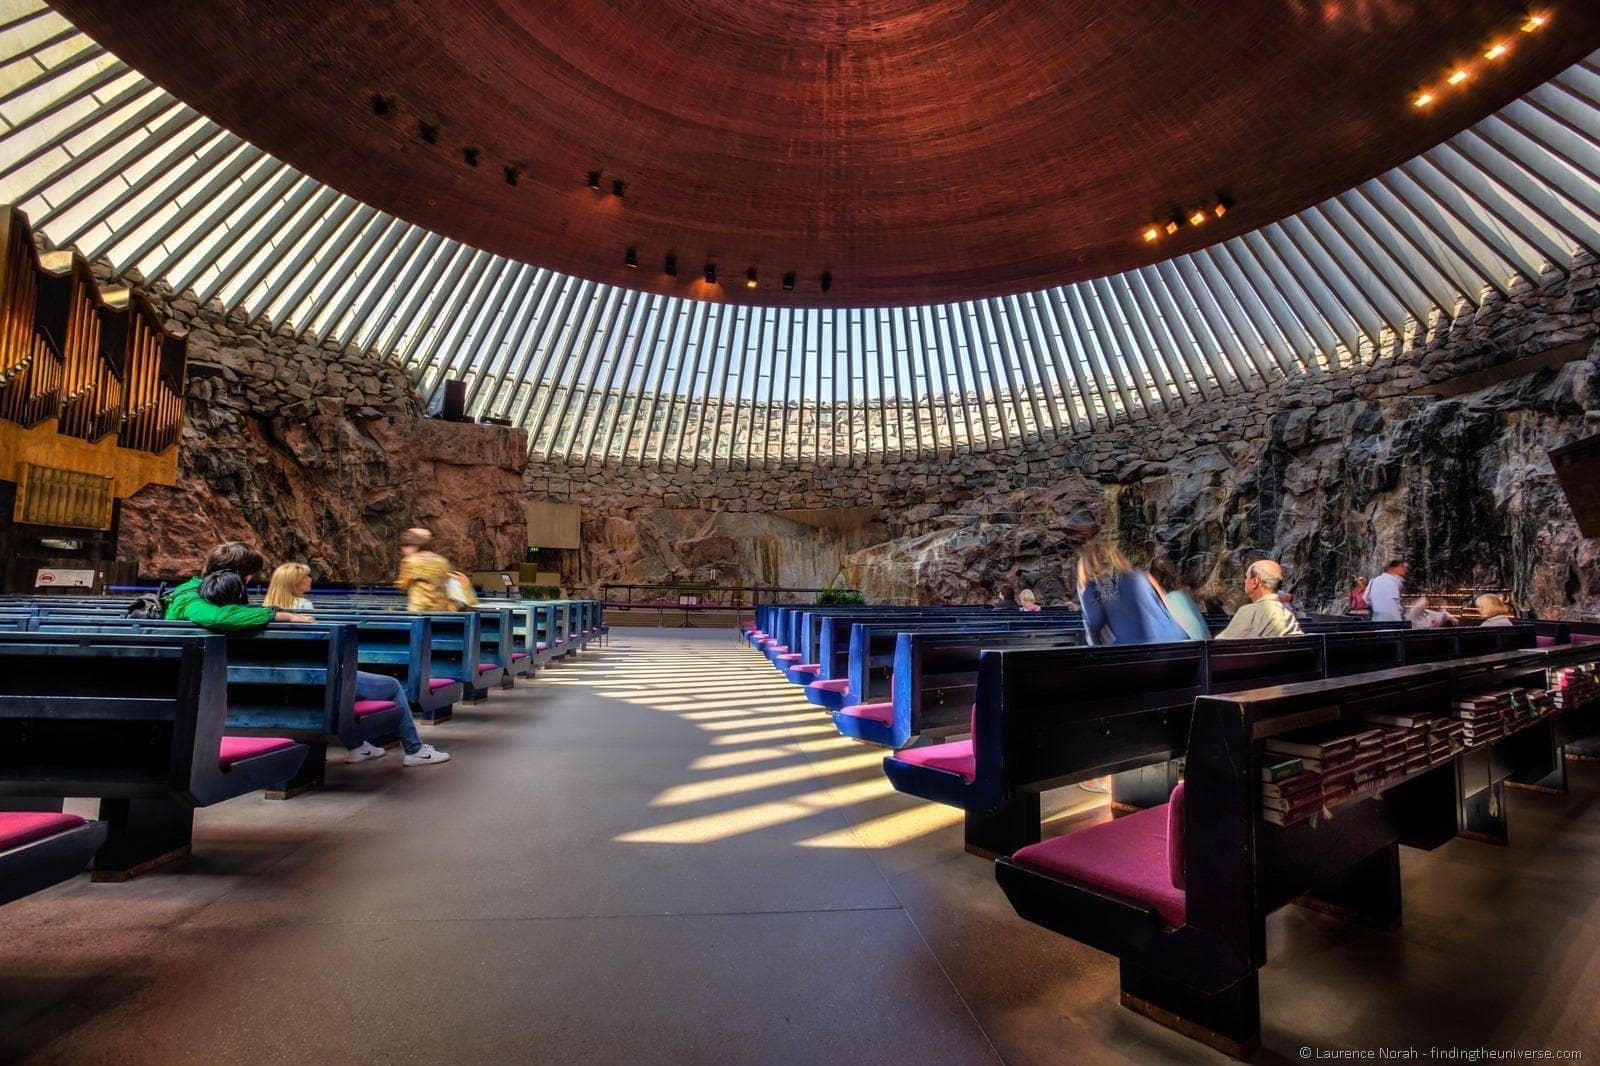 1 day in Helsinki - Temppeliaukio Church of the rock Helsinki finland interior